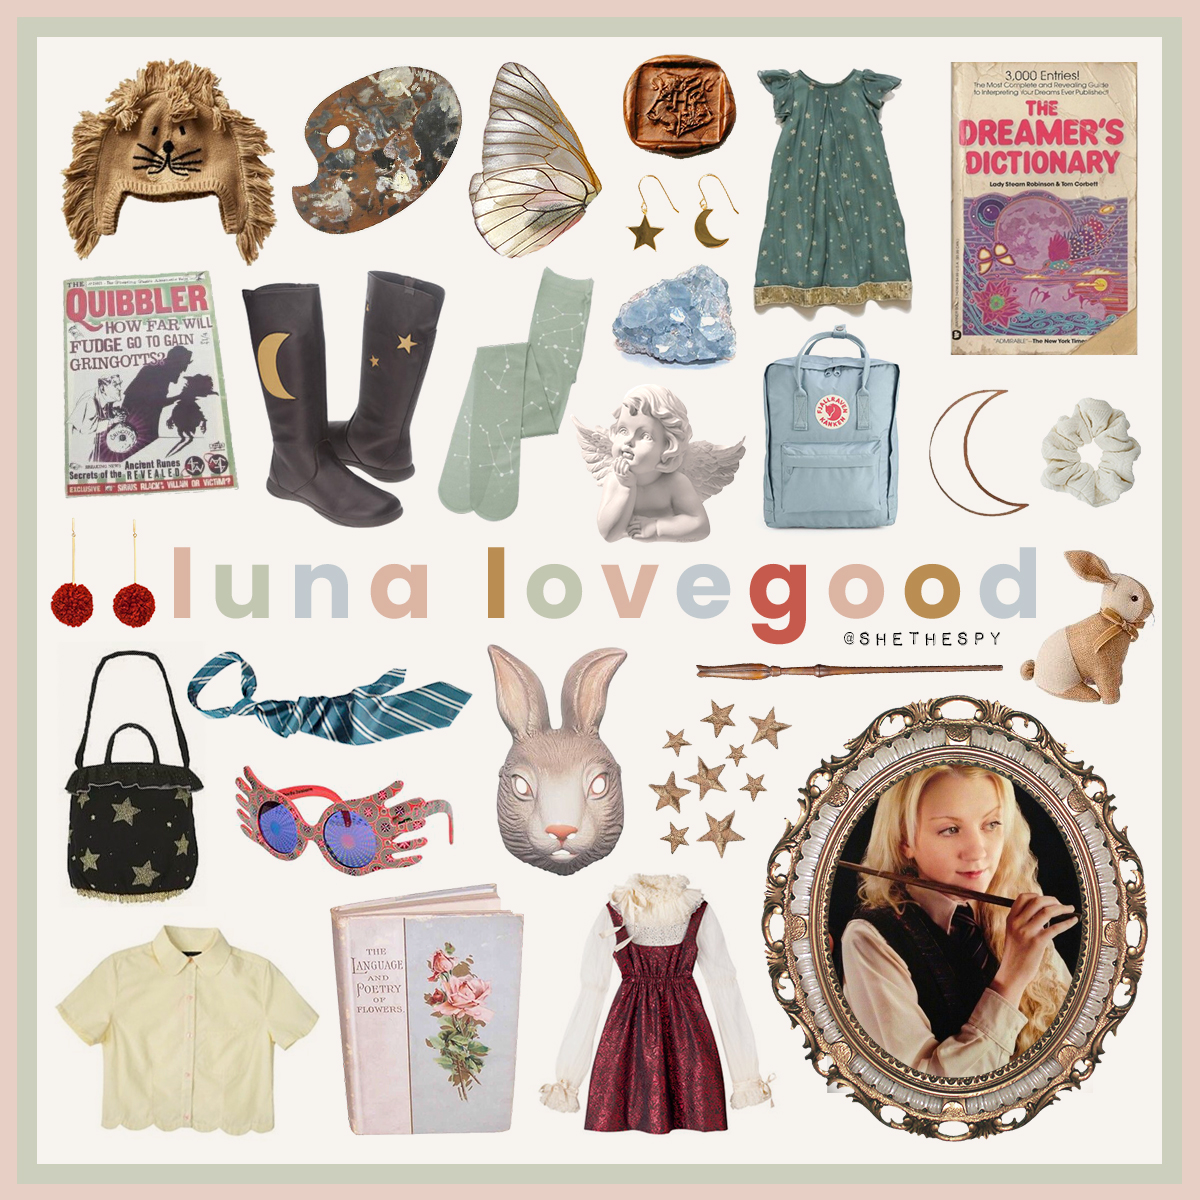 luna-lovegood.jpg